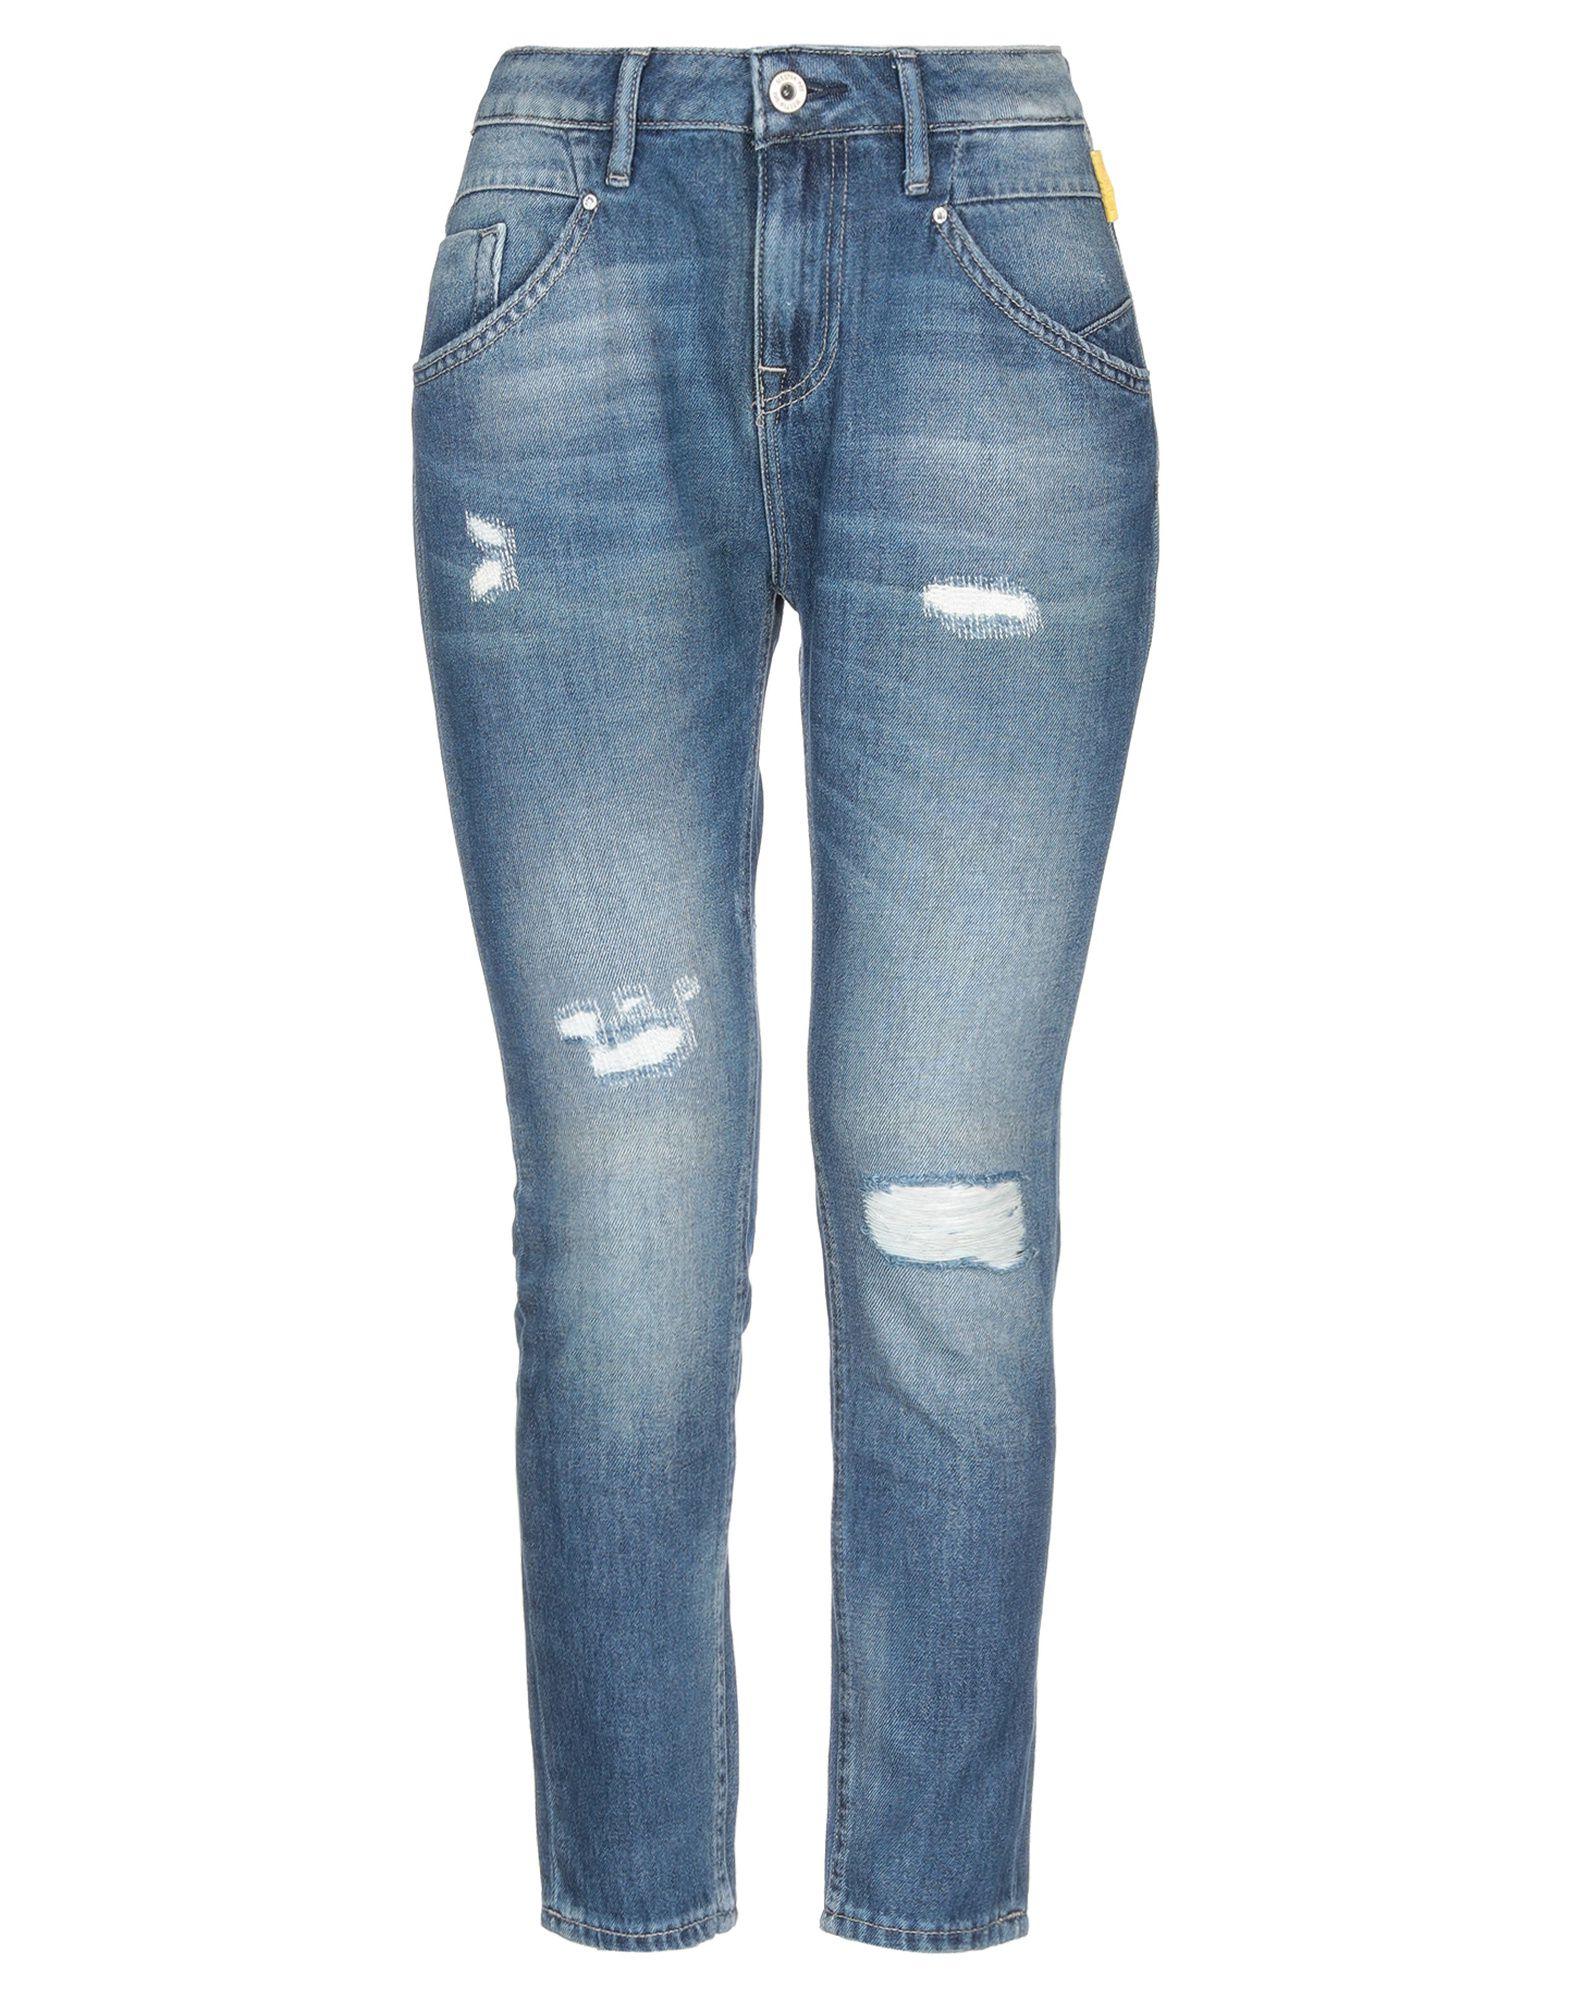 Fashion Shop - MELTIN POT Denim pants - Item 42729505